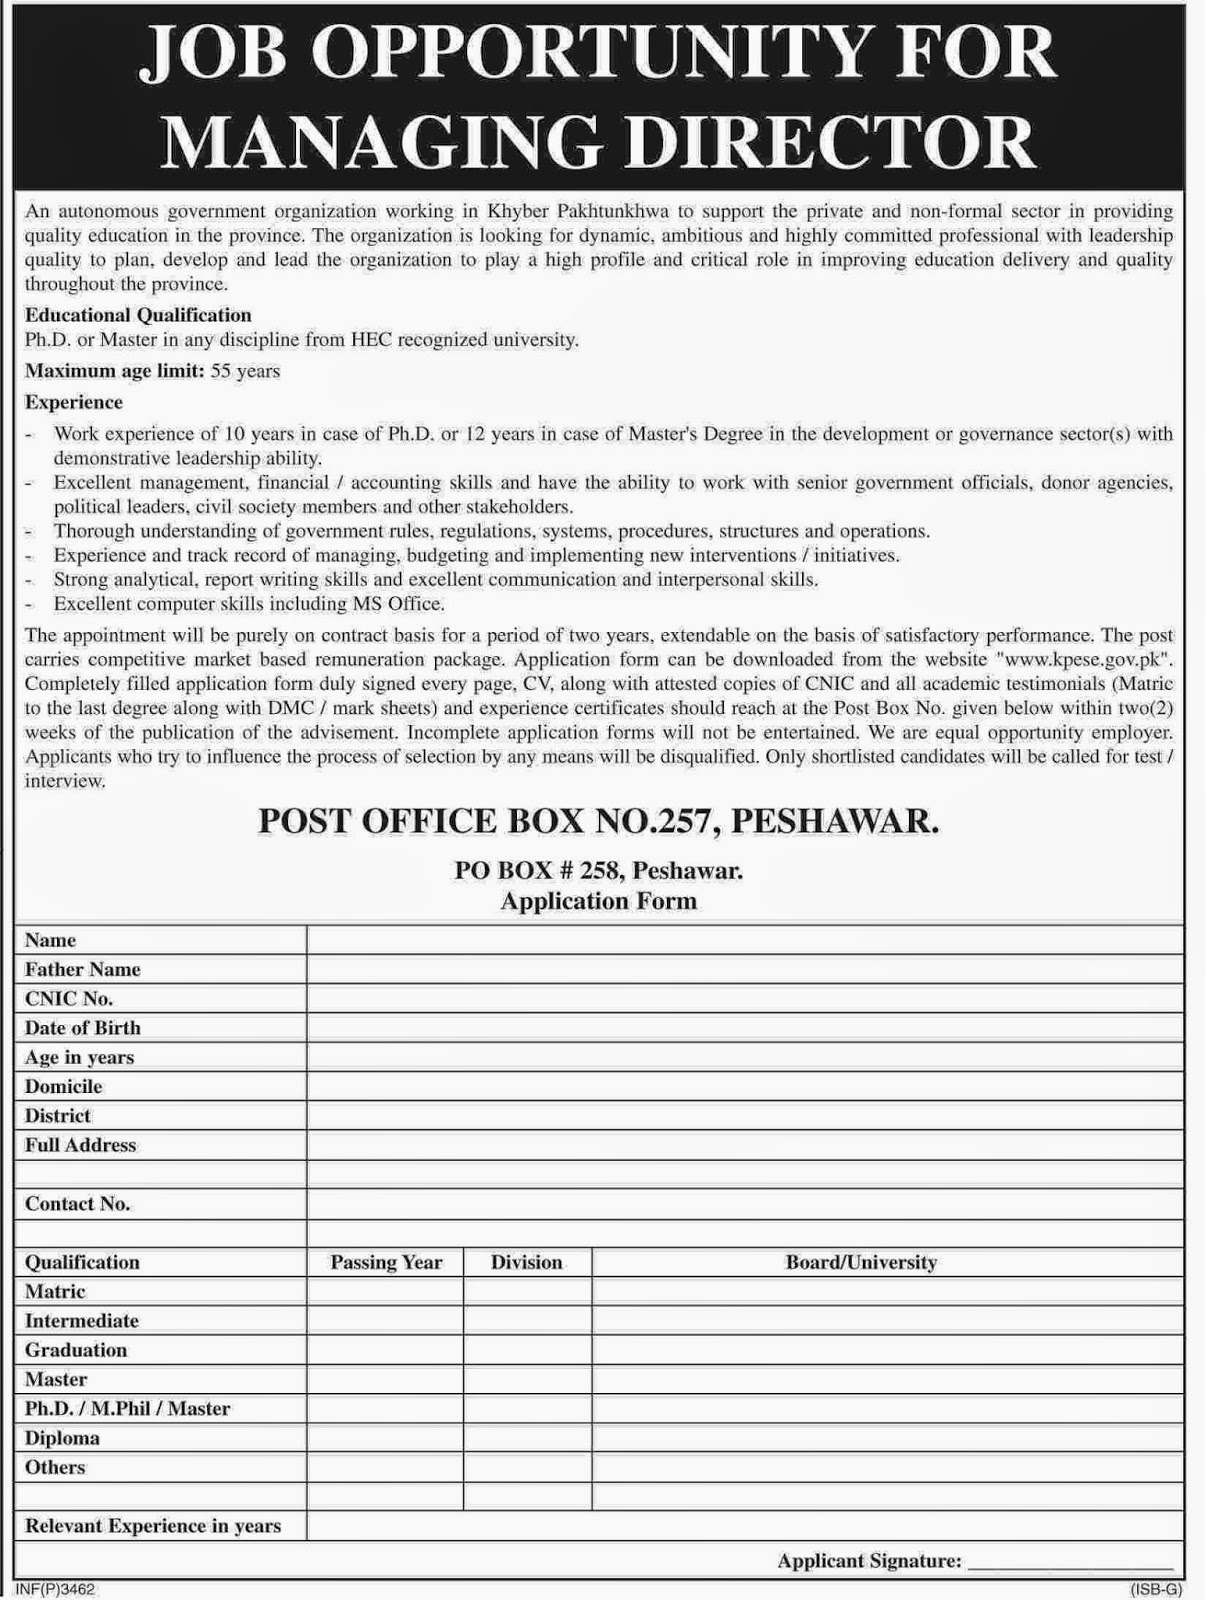 Jobs for Managing Director in Government Organization of KPK, Peshawar